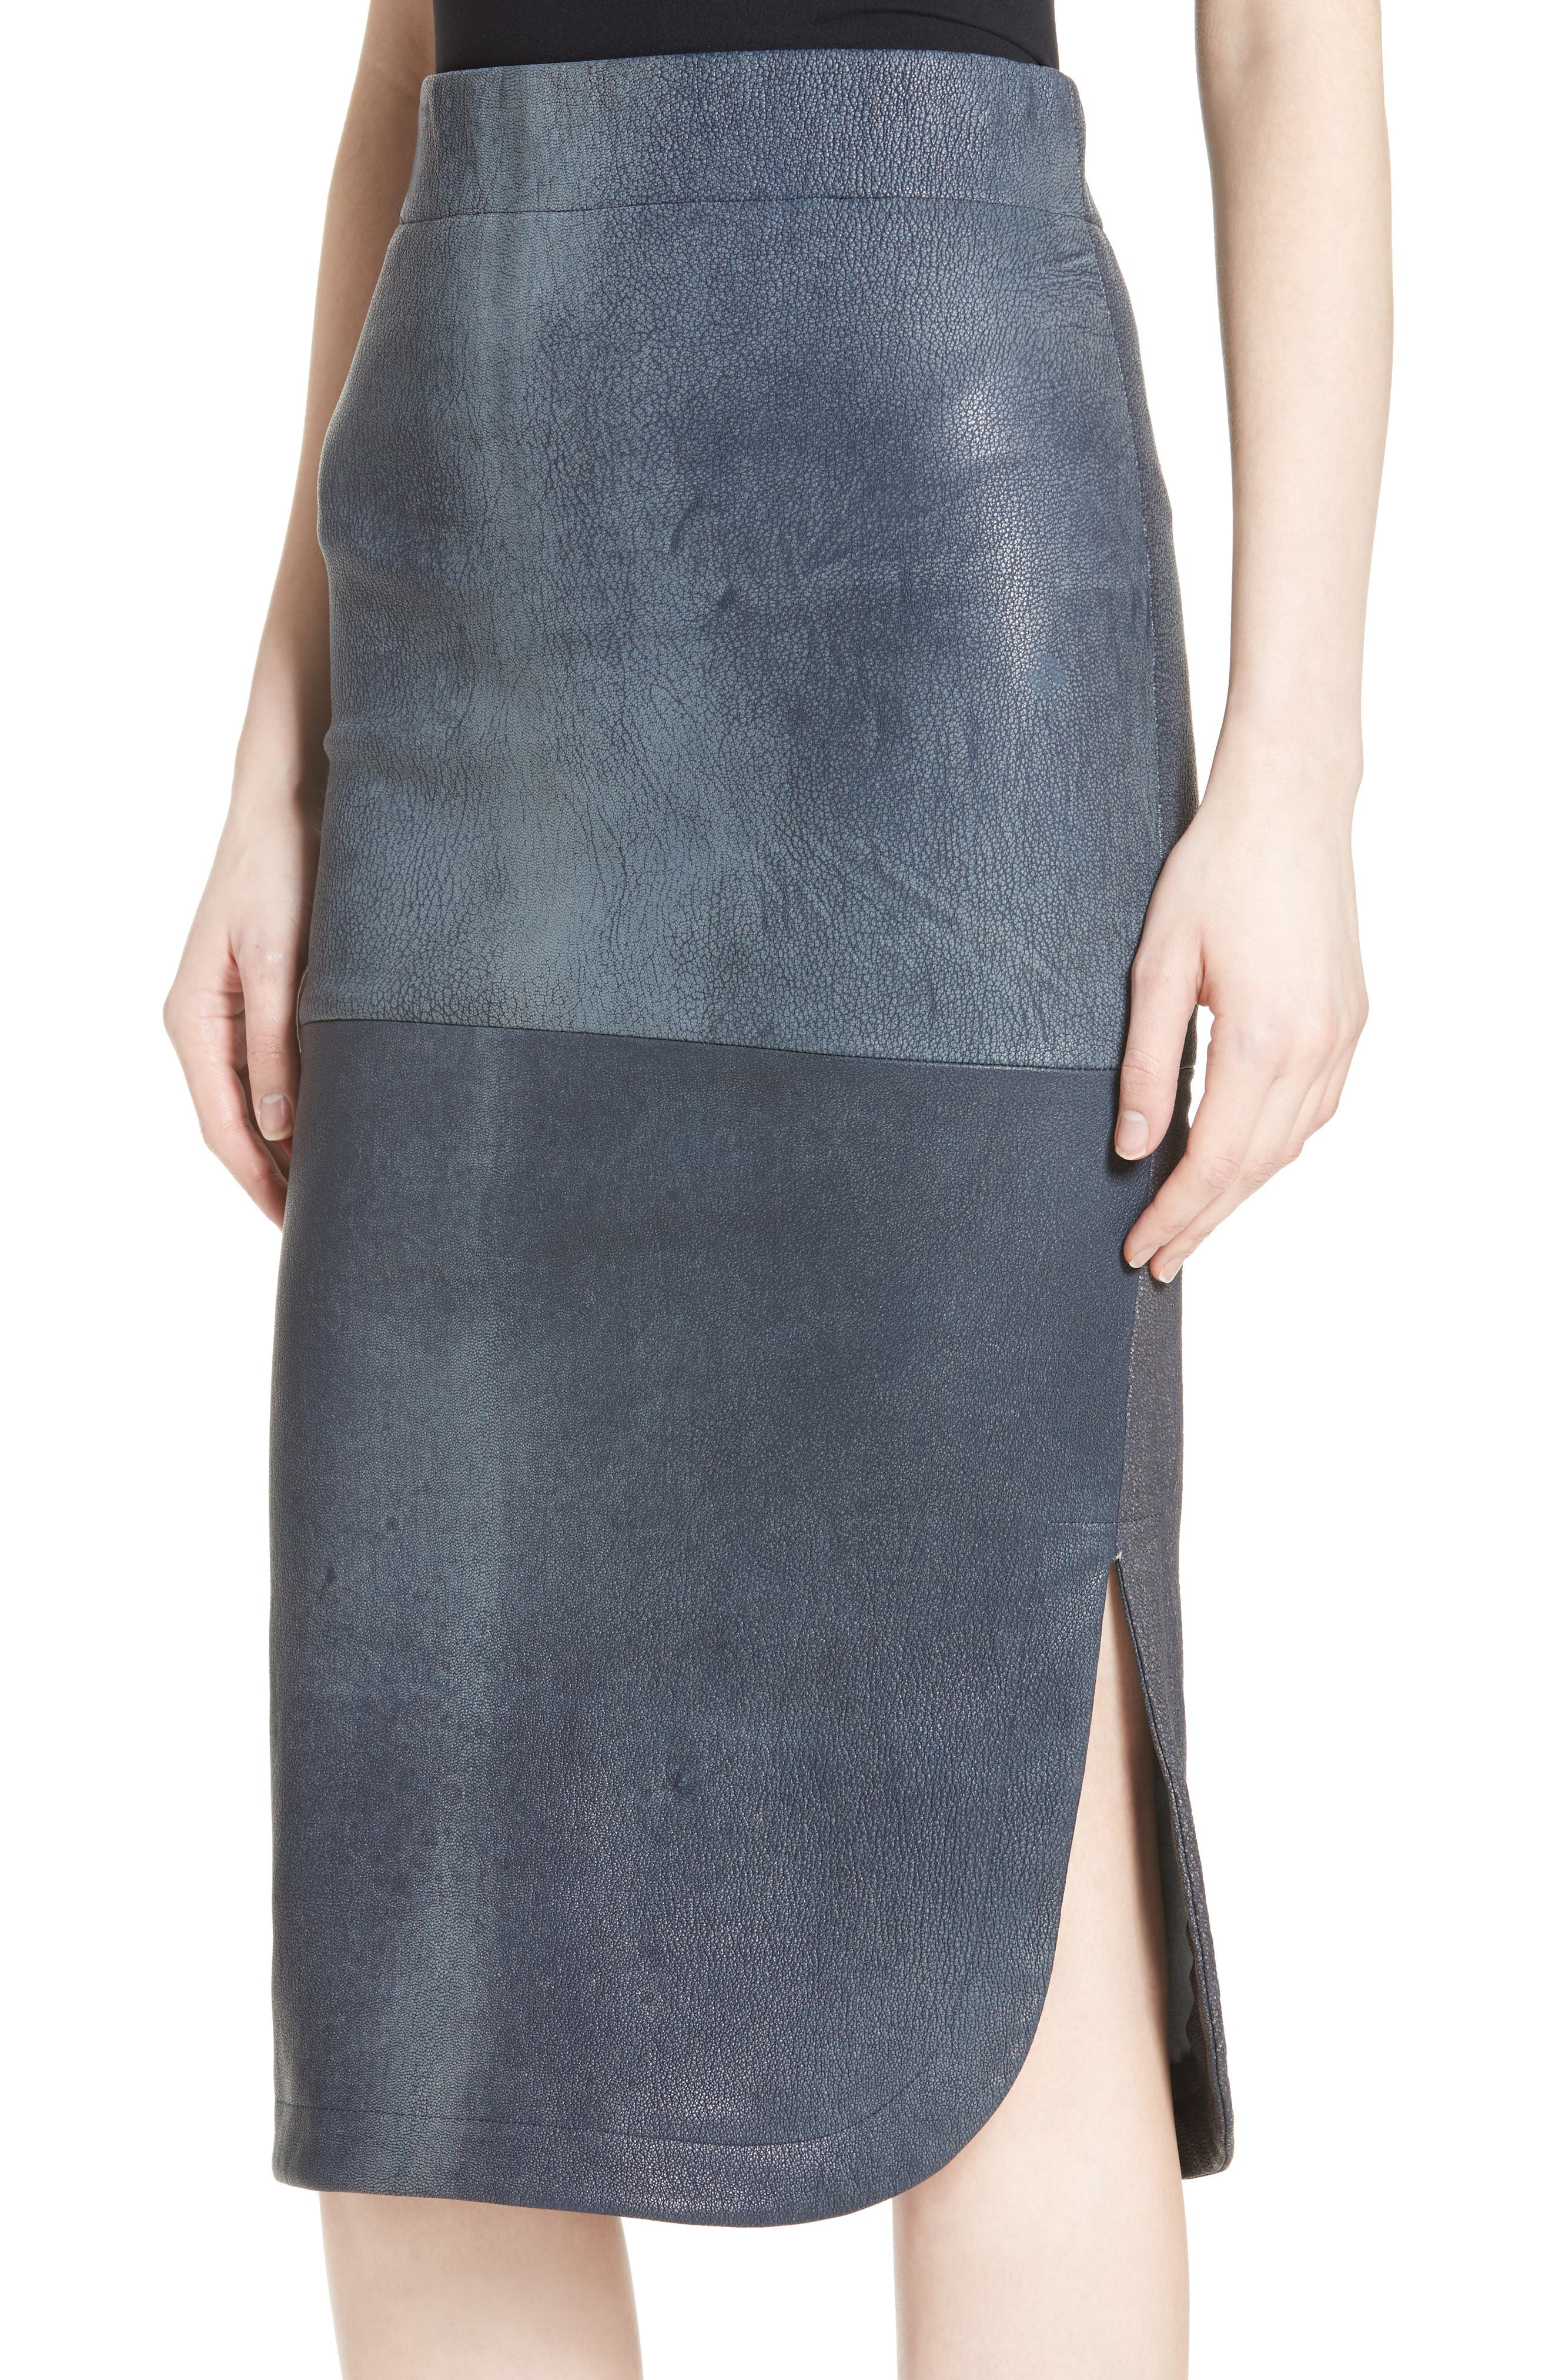 Rai Leather Curved Skirt,                             Alternate thumbnail 4, color,                             400